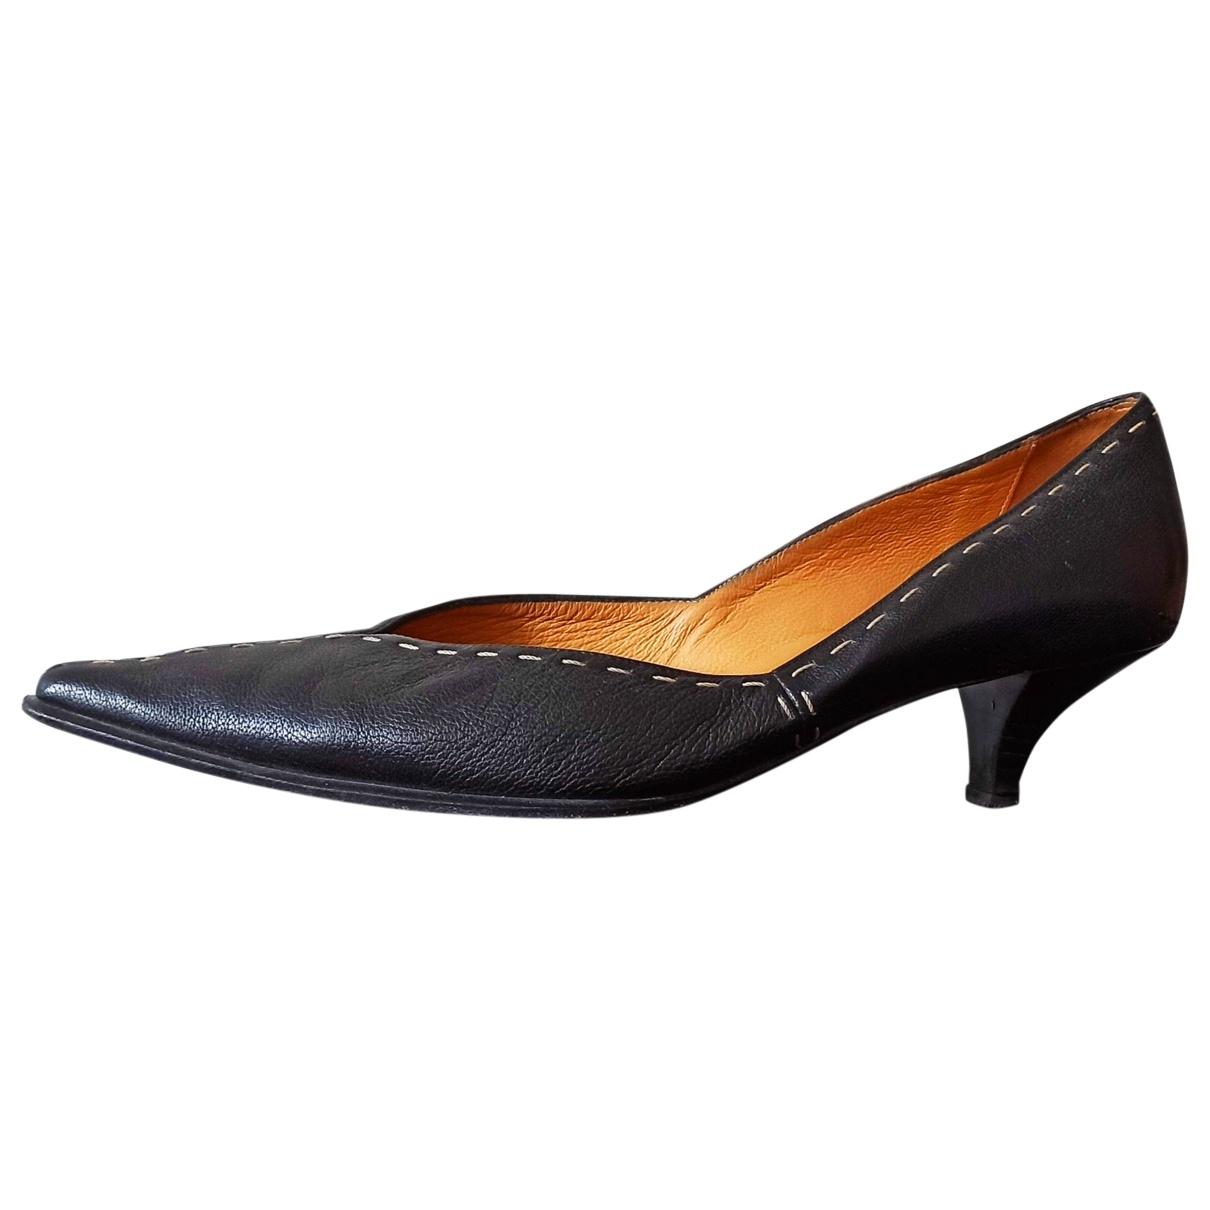 Hermès \N Black Leather Heels for Women 38.5 EU